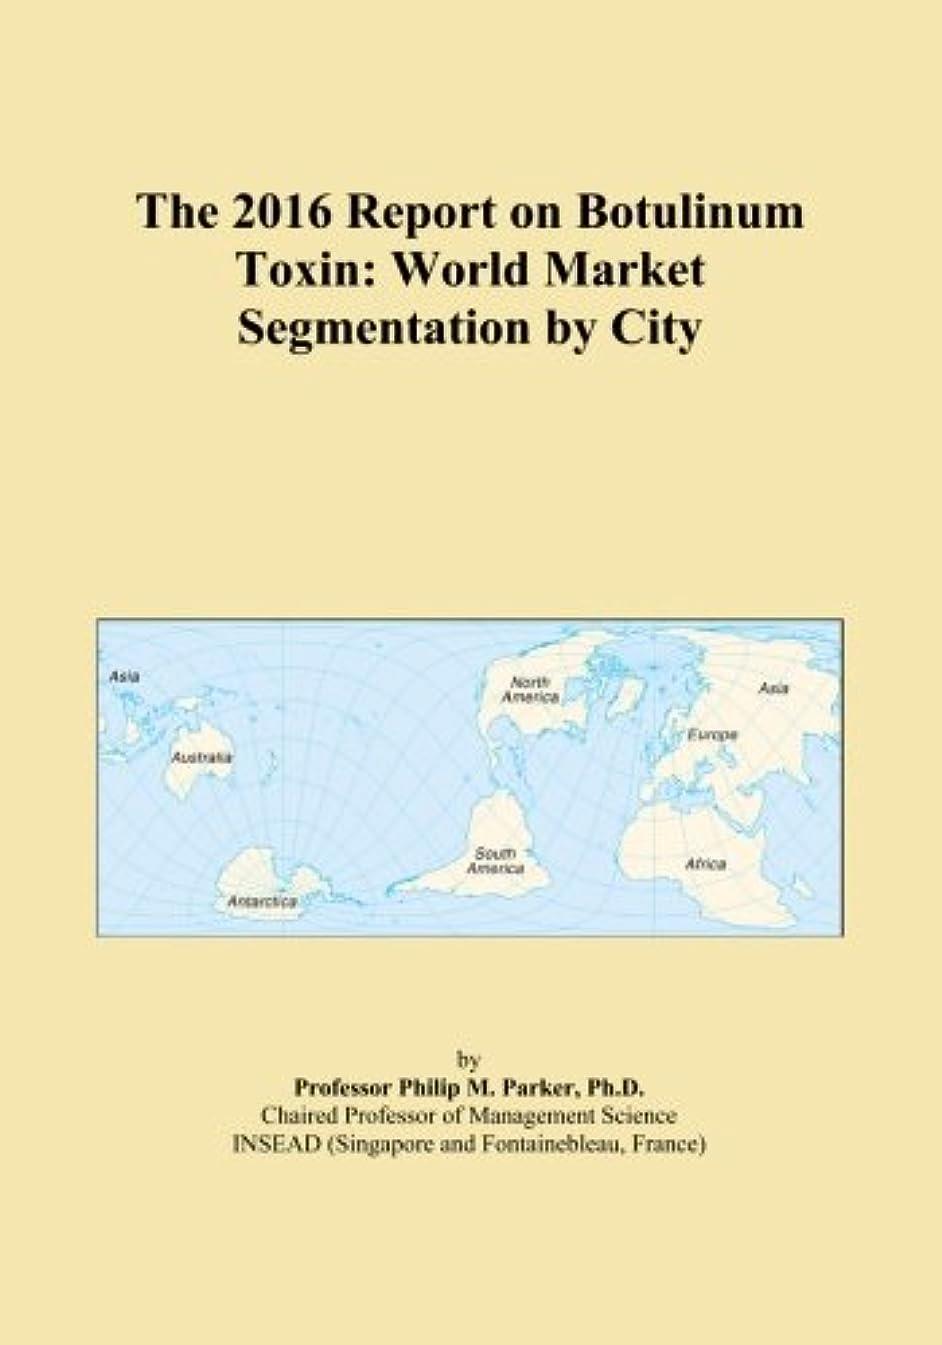 The 2016 Report on Botulinum Toxin: World Market Segmentation by City